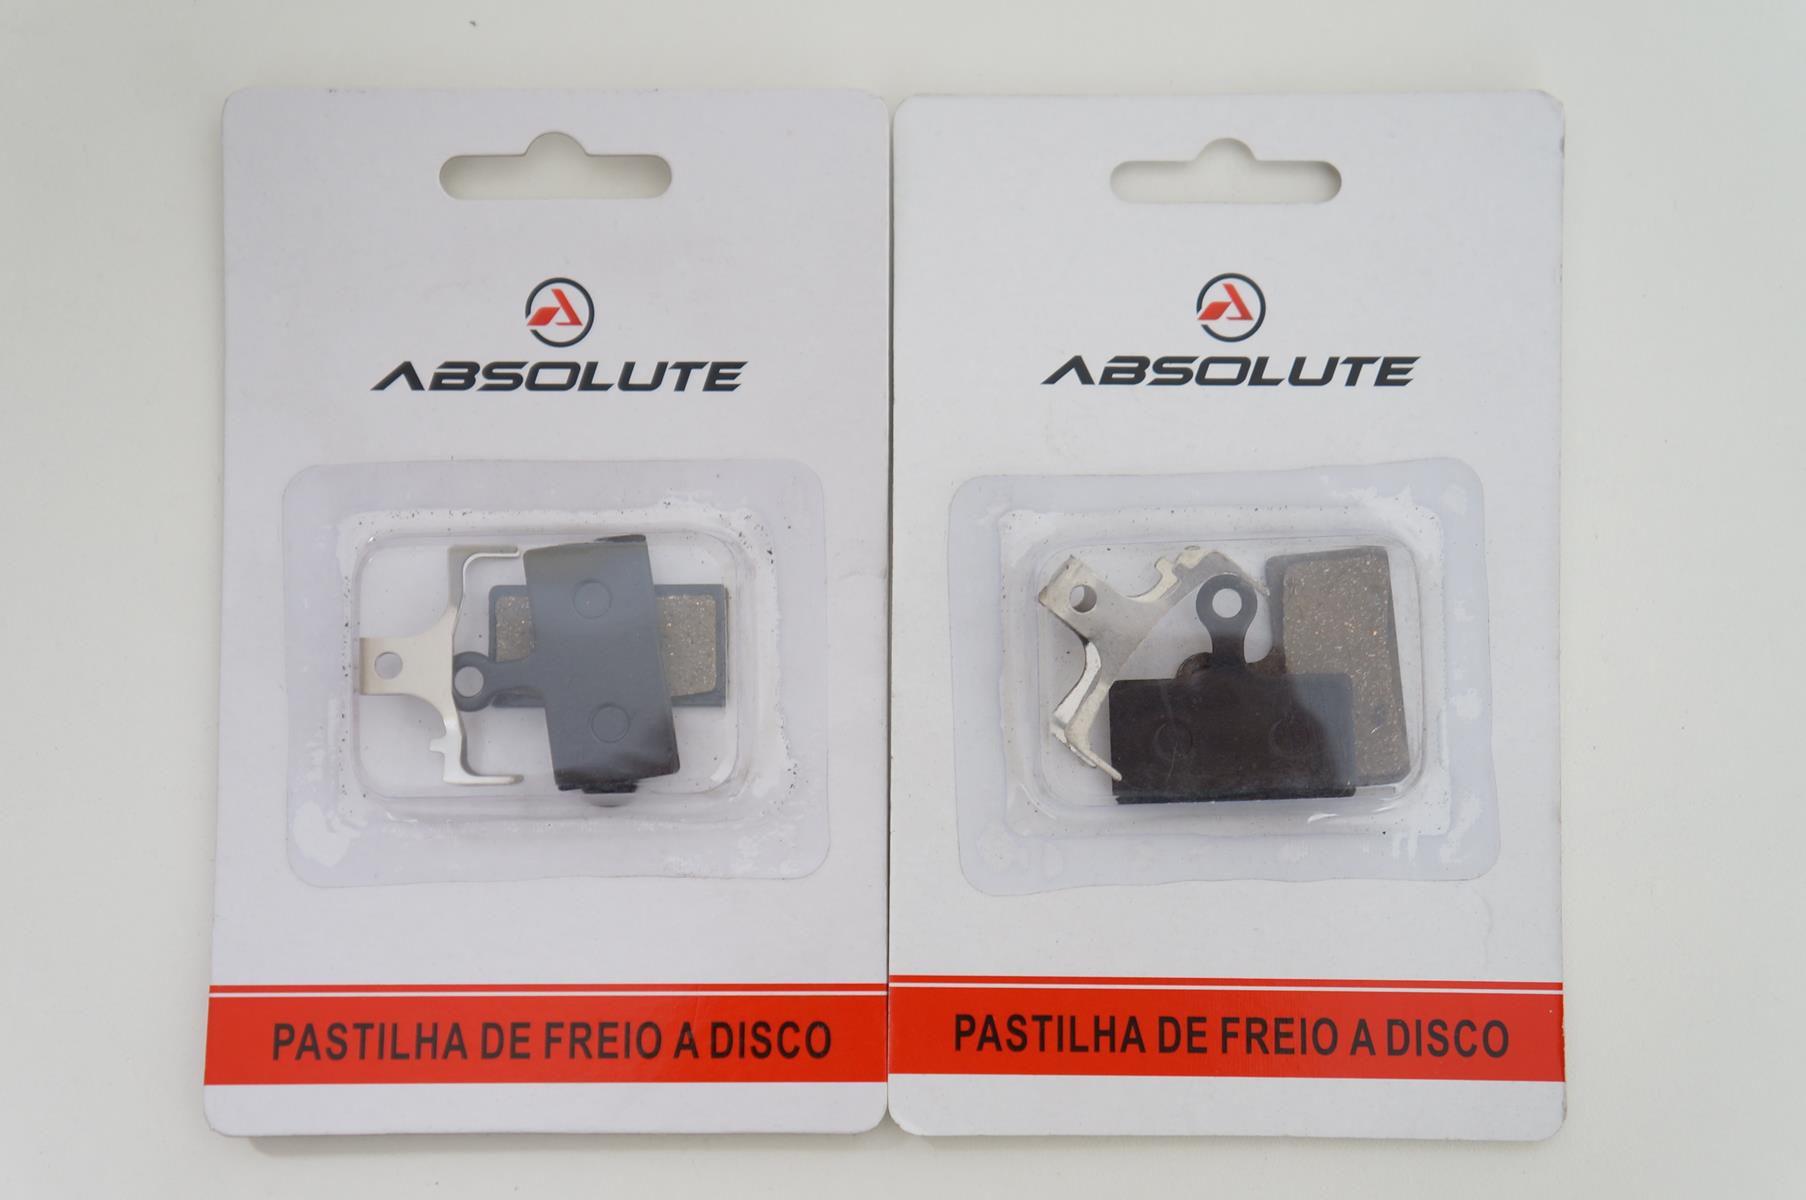 Par de Pastilhas Freio à Disco Absolute para Shimano SLX XT XTR M675 M785 M8000 M987